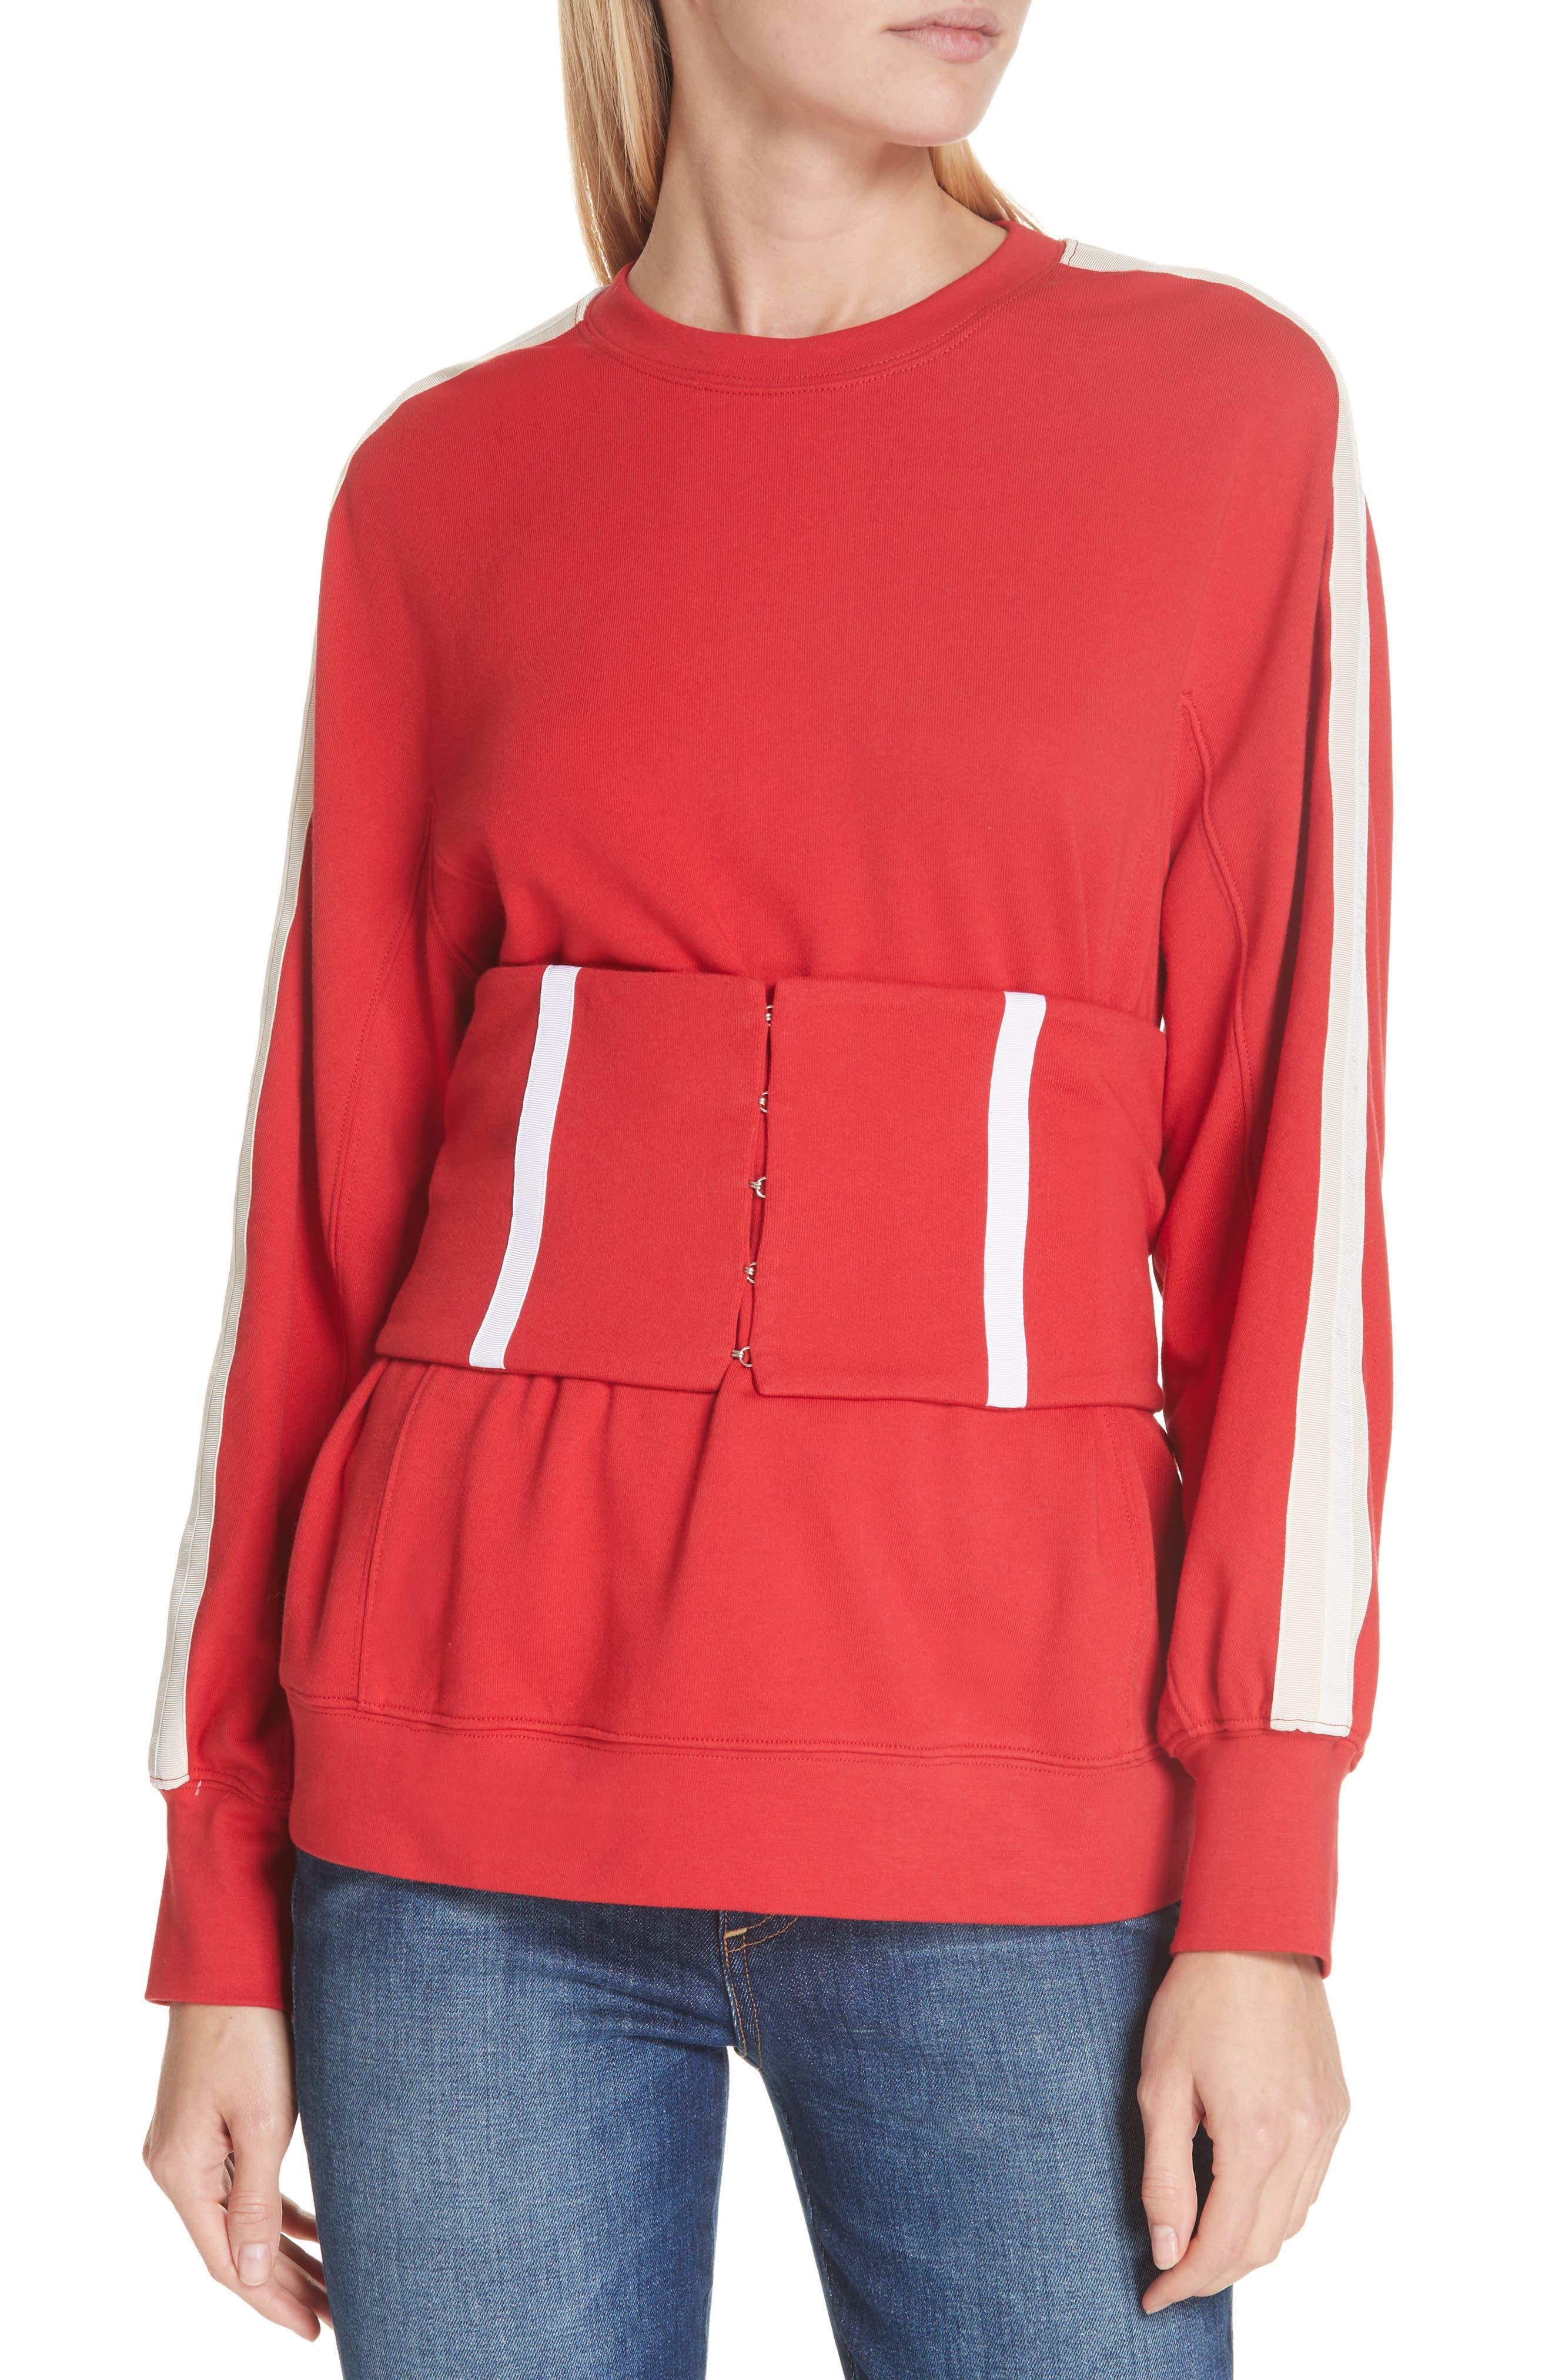 Jonathan Simkhai Corset Sweatshirt, Red